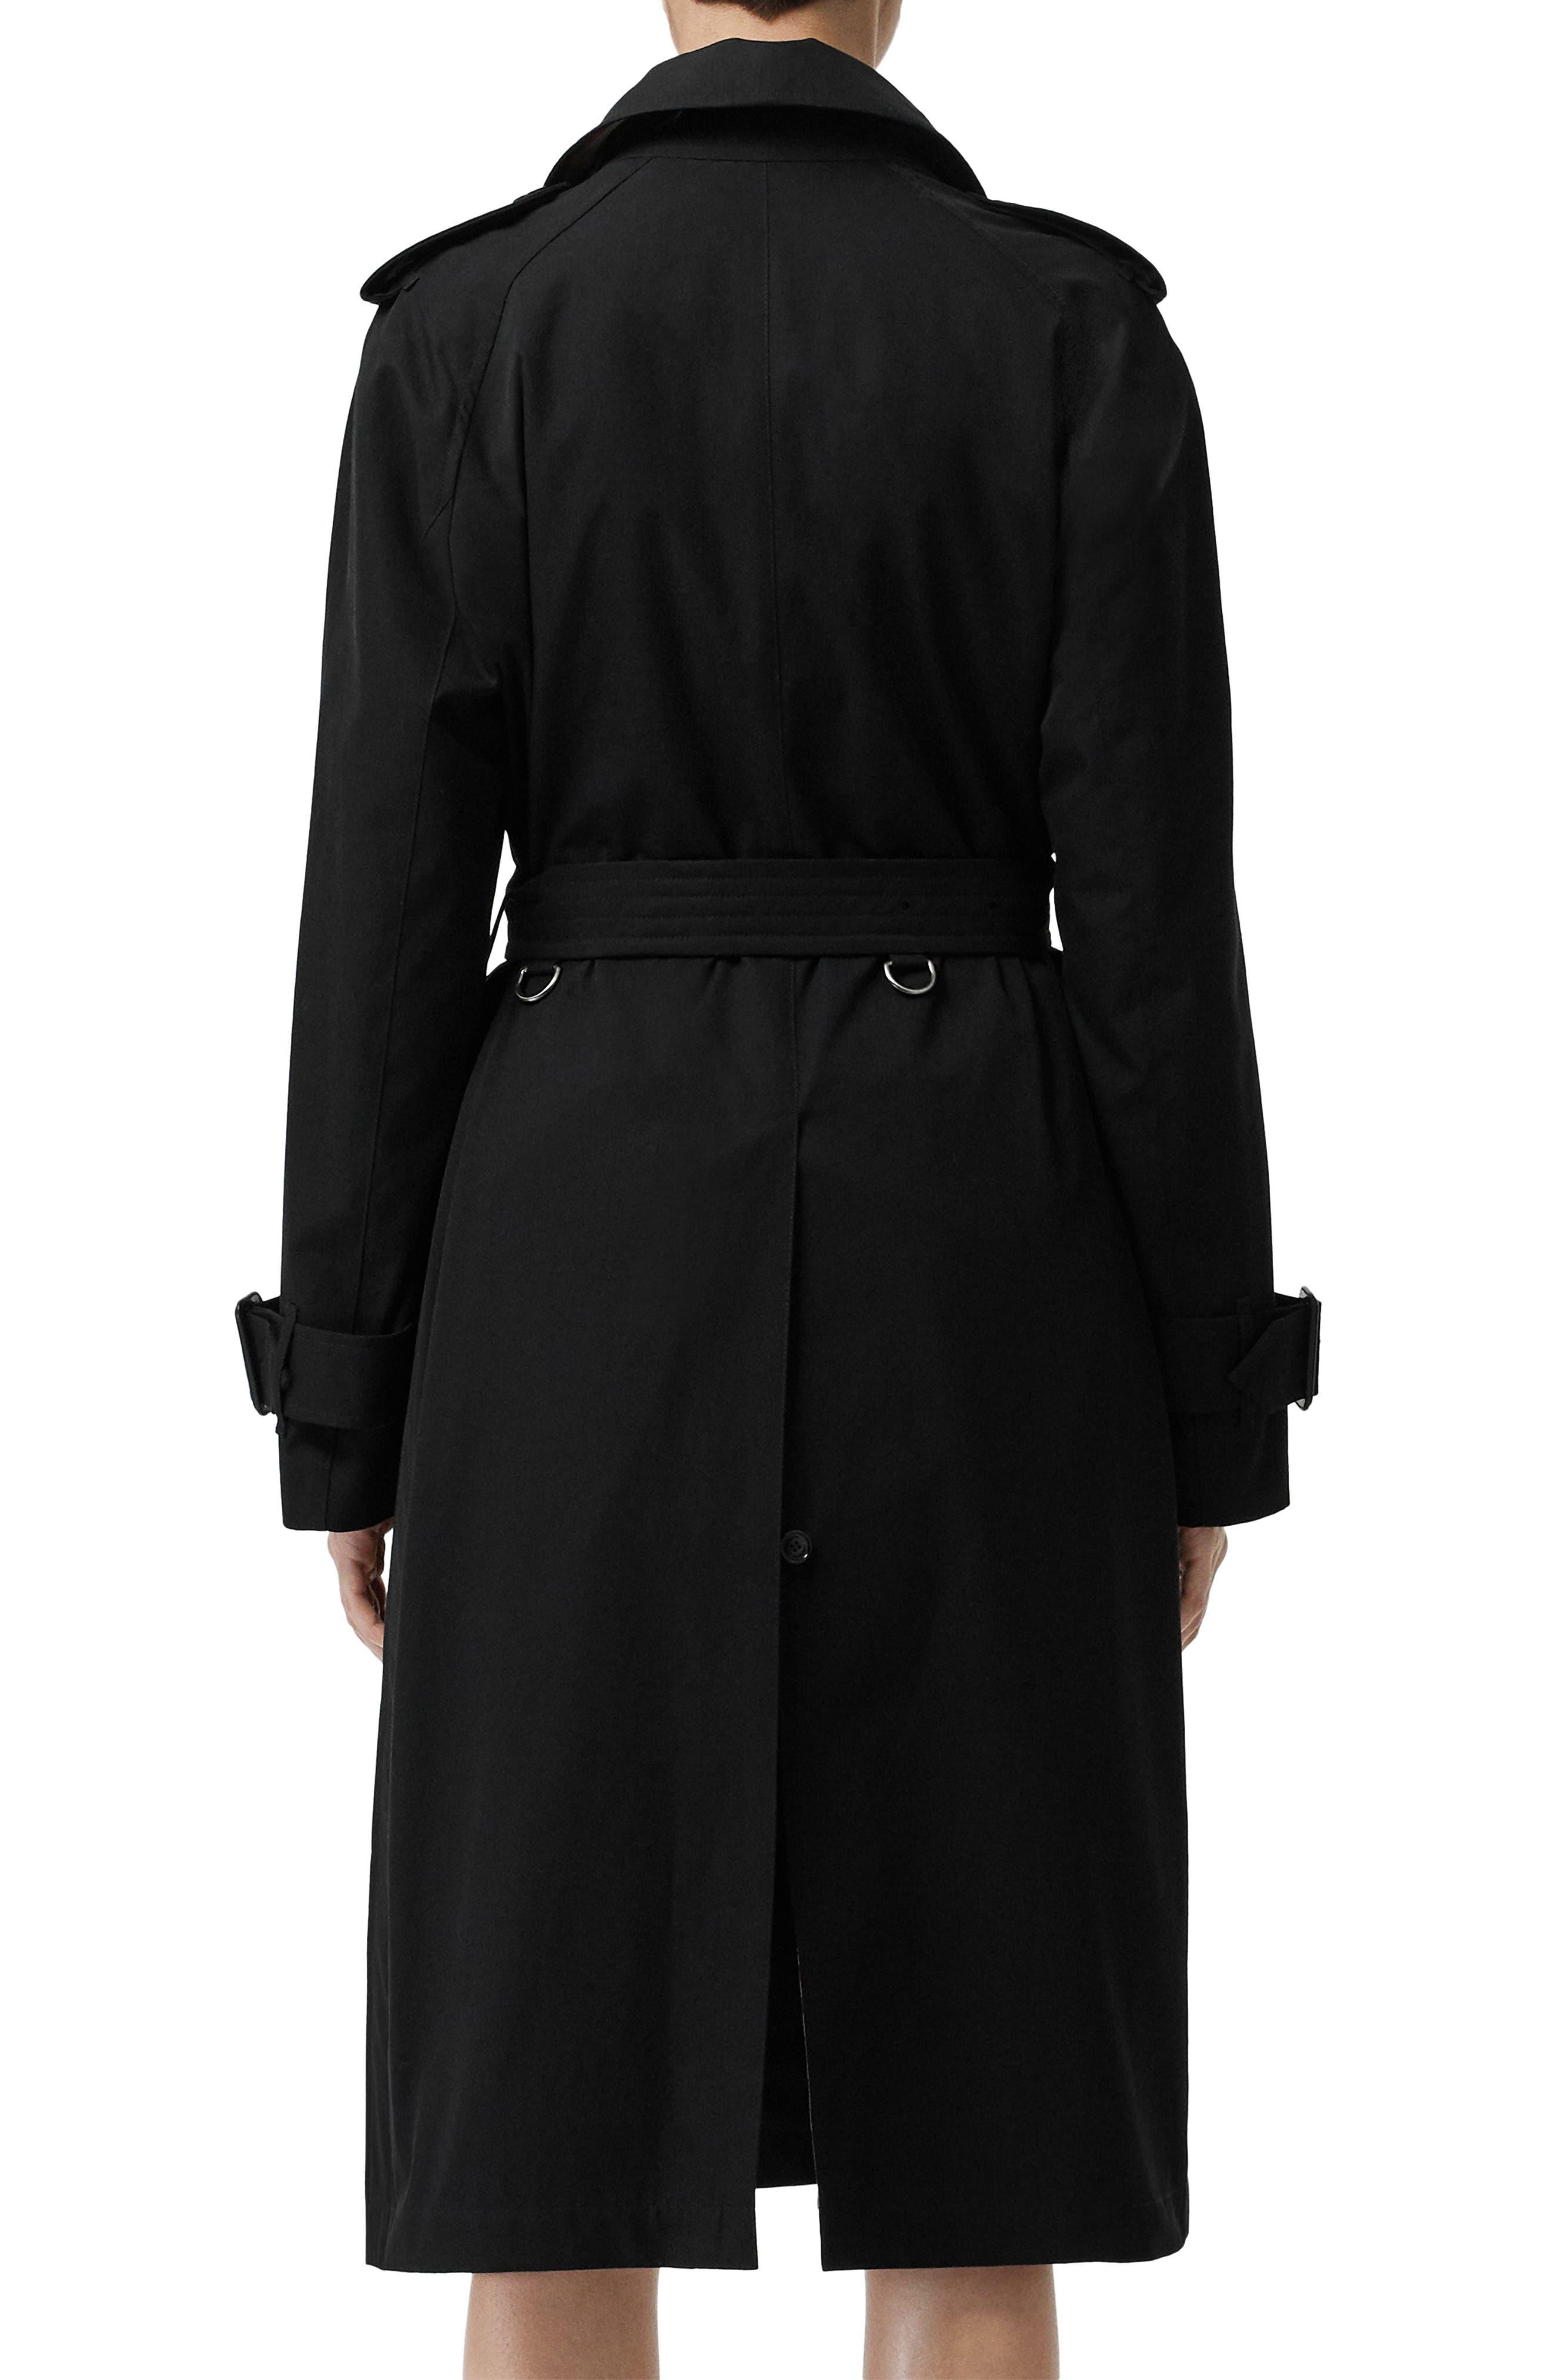 BURBERRY, Crostwick Side Slit Tropical Gabardine Trench Coat, Alternate thumbnail 6, color, BLACK